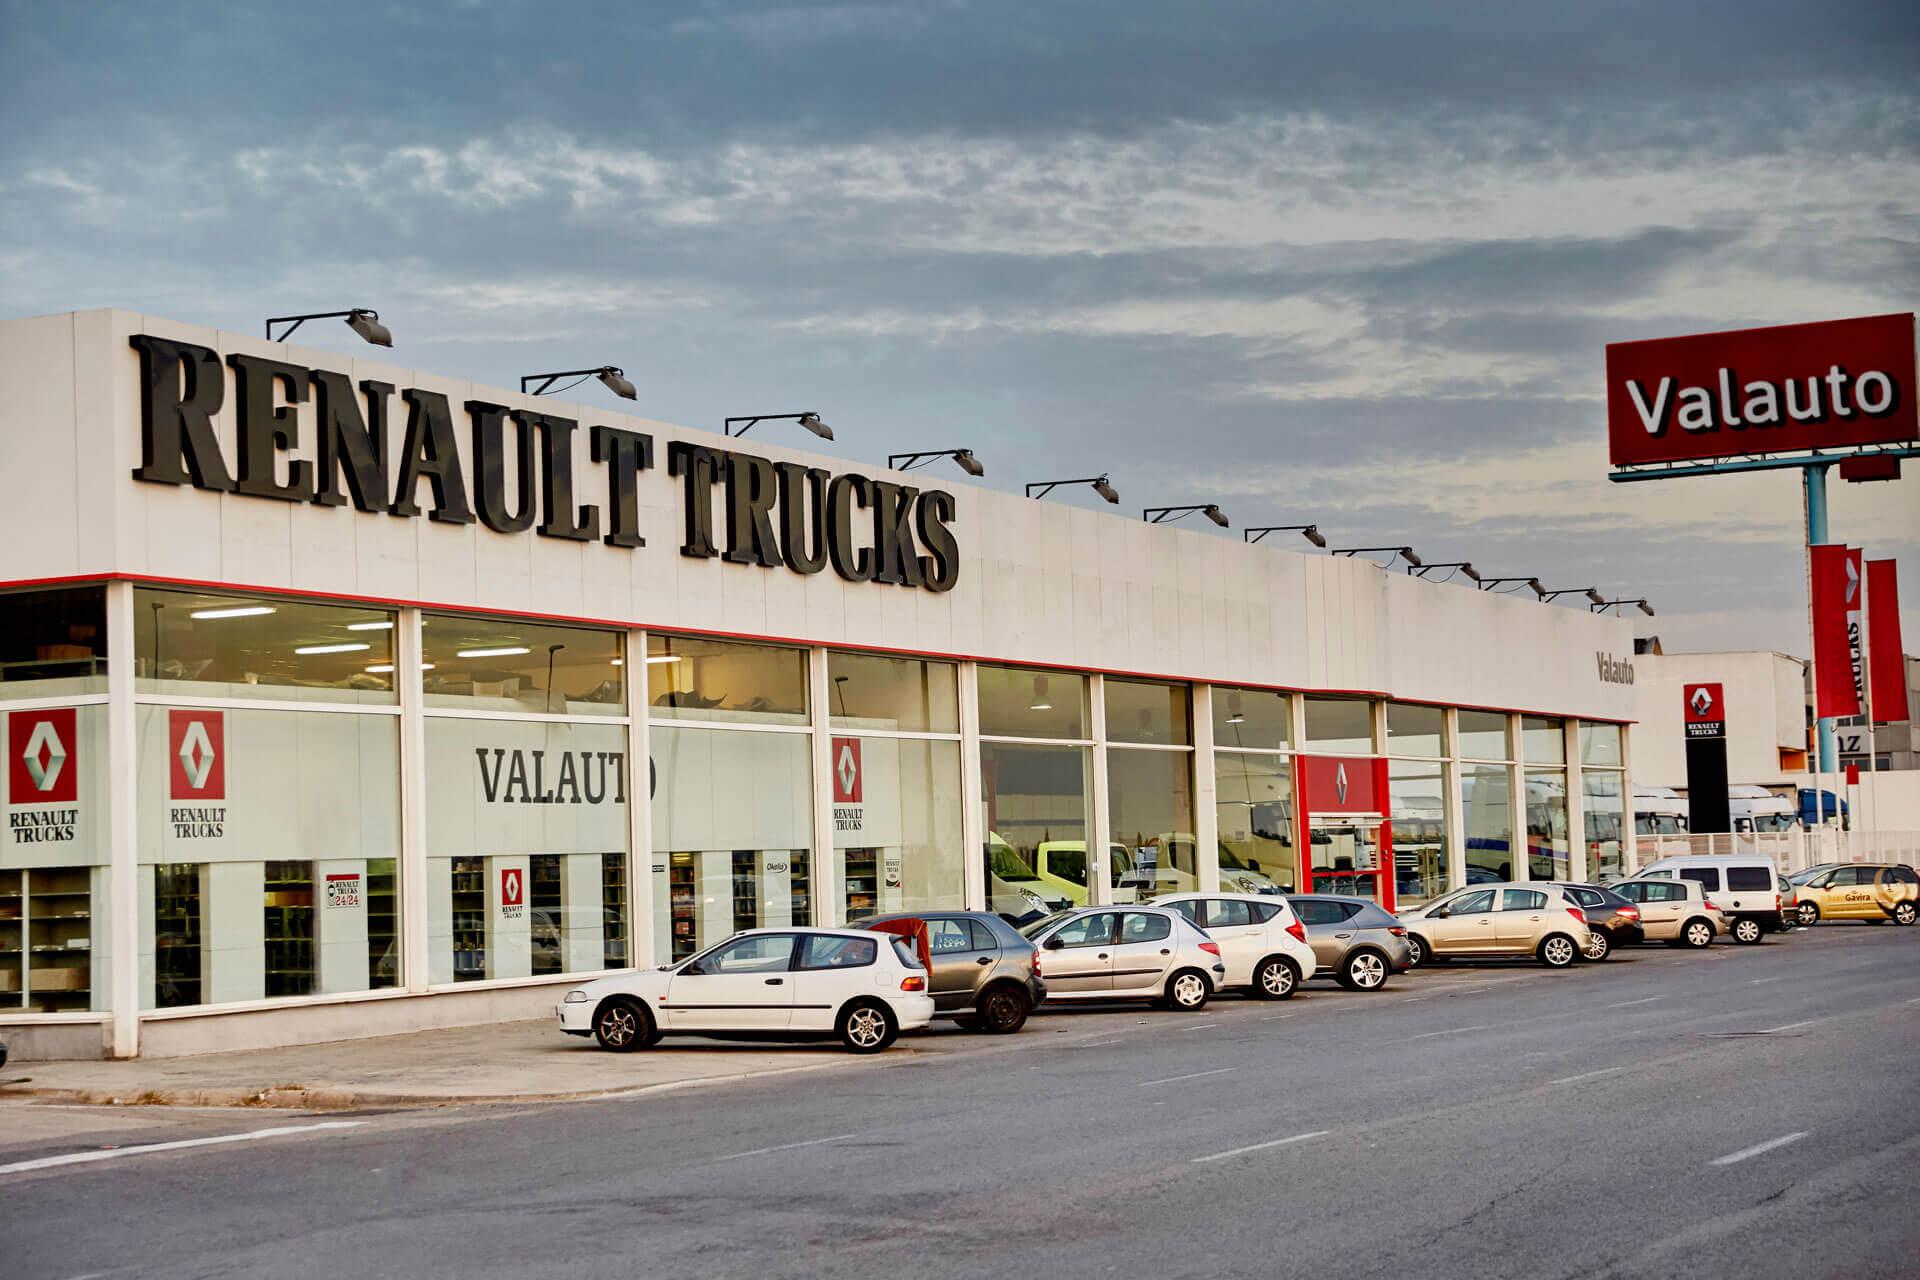 renault trucks valauto